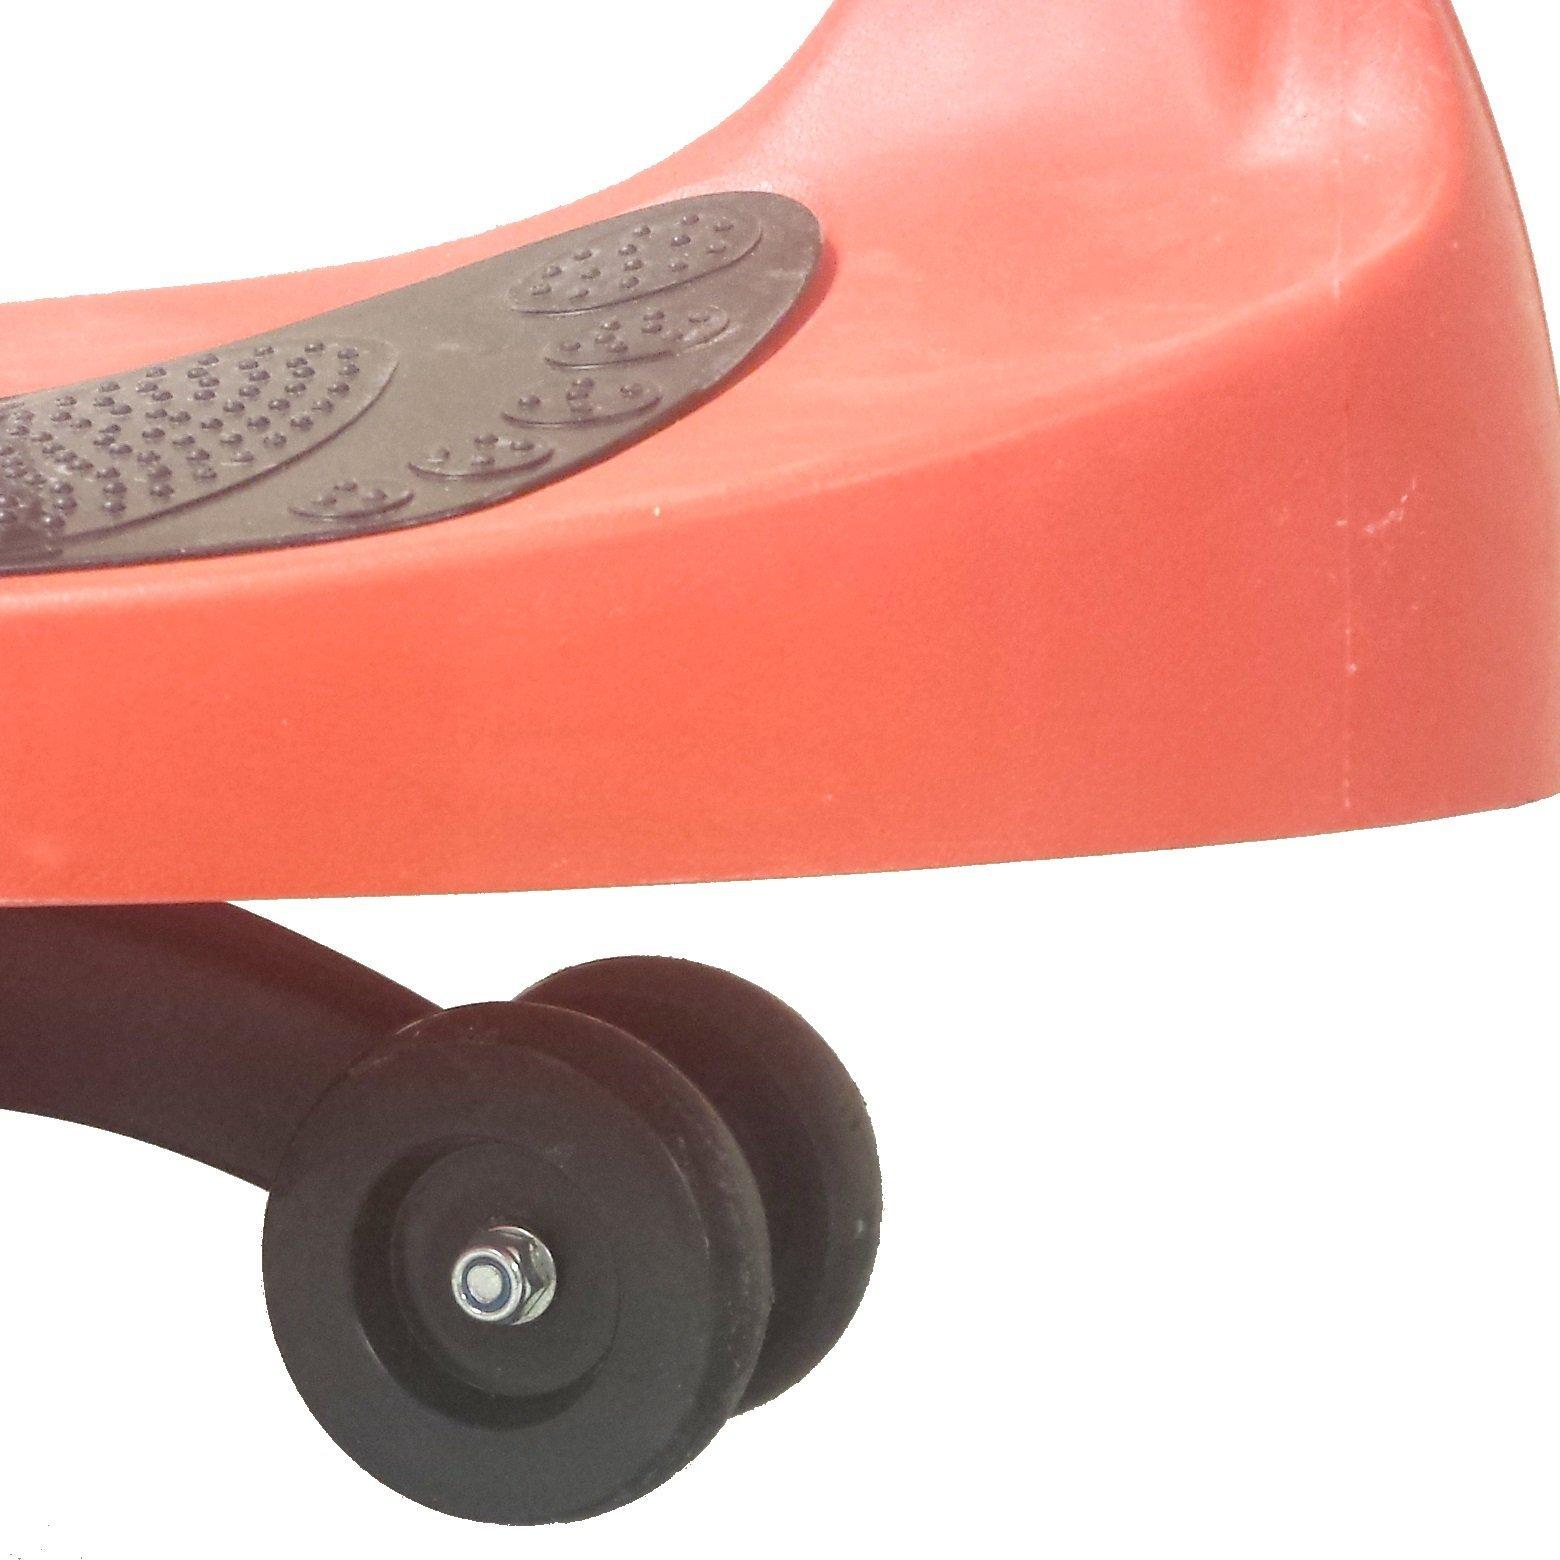 Polyurethane Wheel Co Plasma Car Front Stabilizing Wheels Replacements